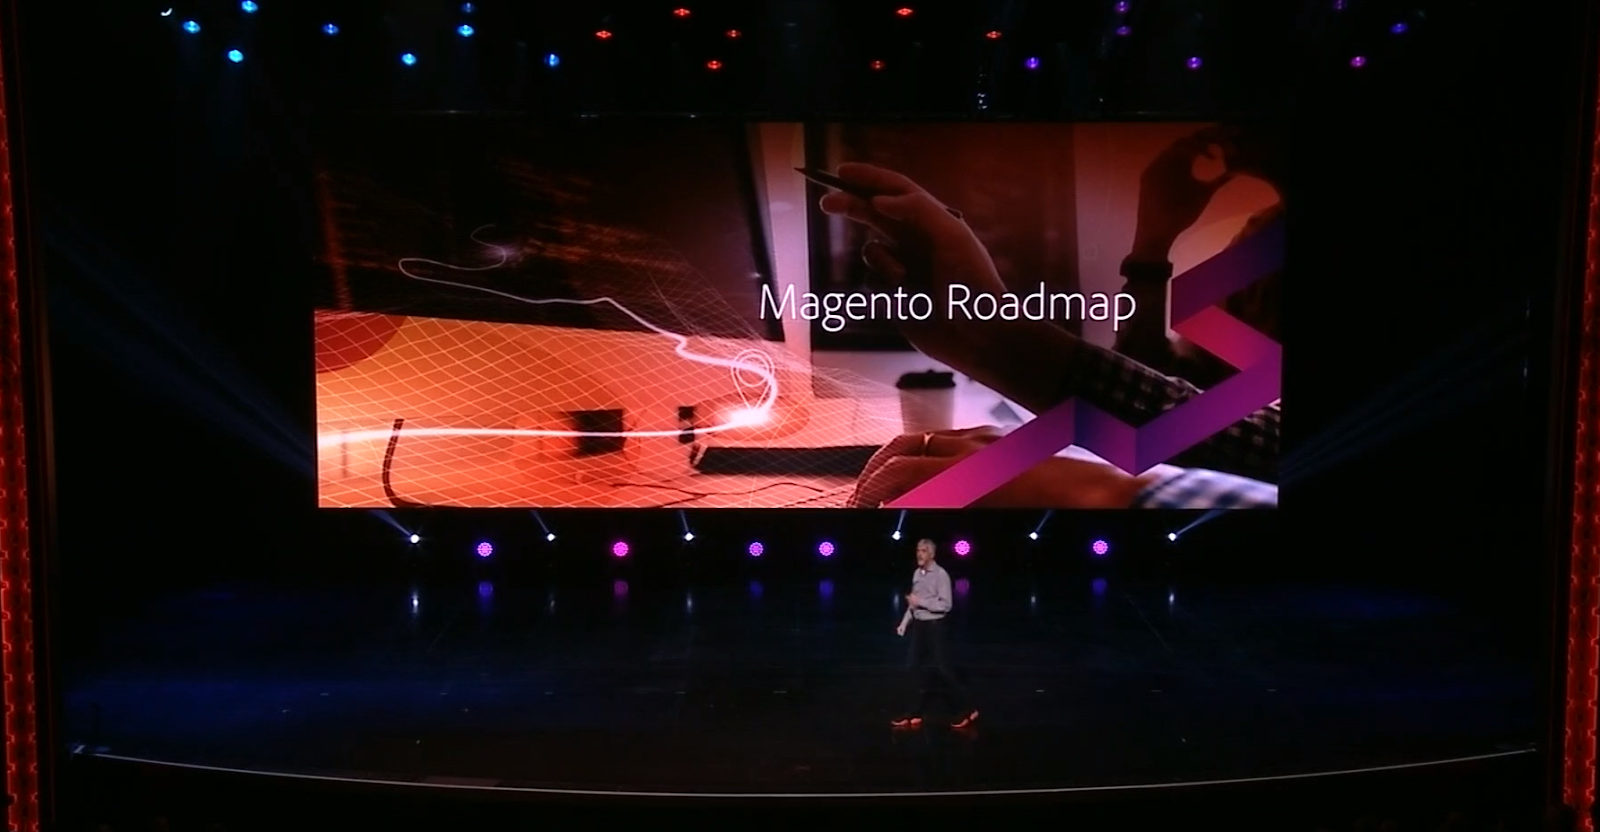 Magento Roadmap